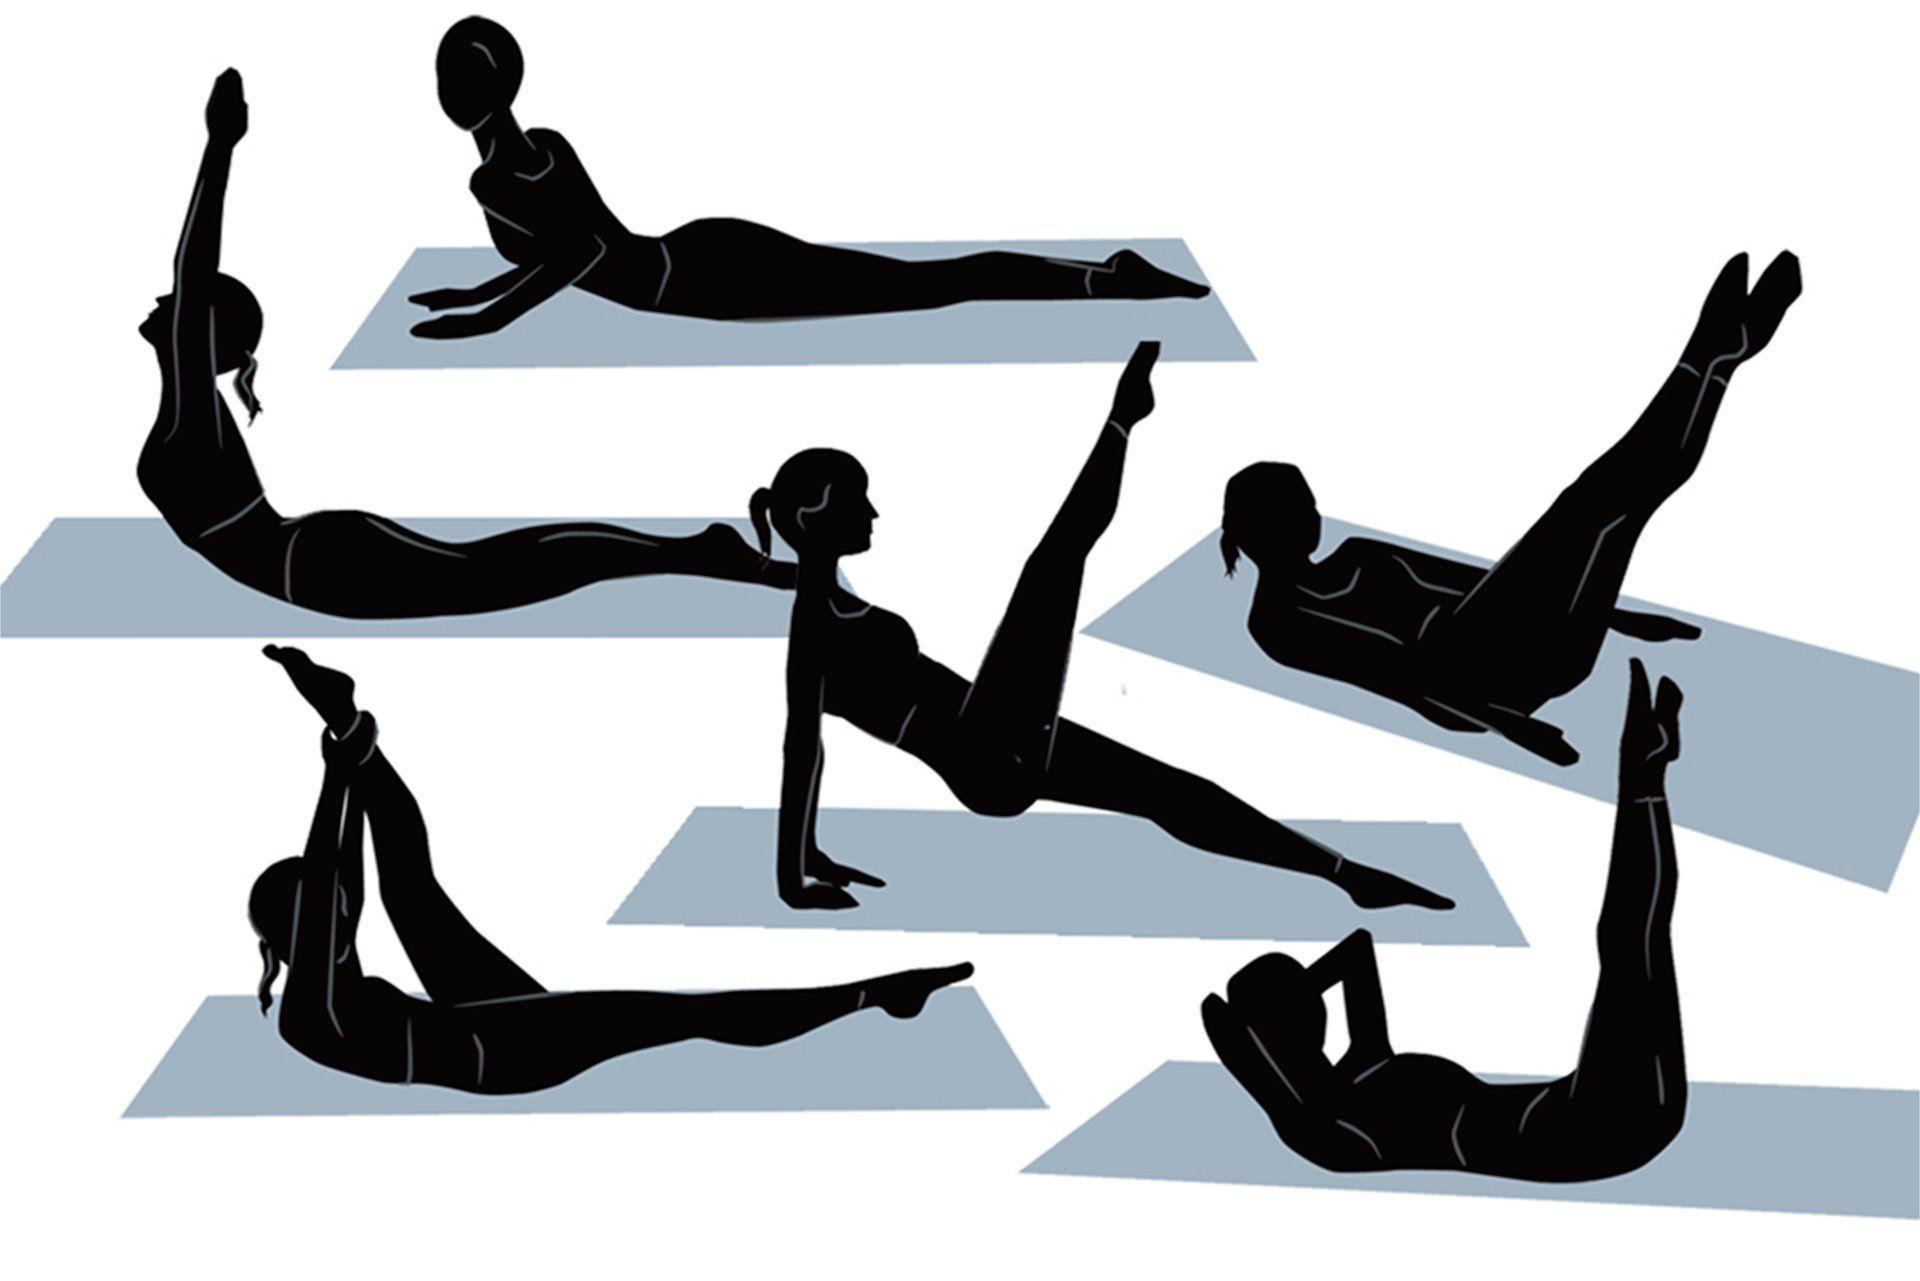 pilates ginnastica posturale addominali esercizi addominali artrosi cervicale lombosciatalgia